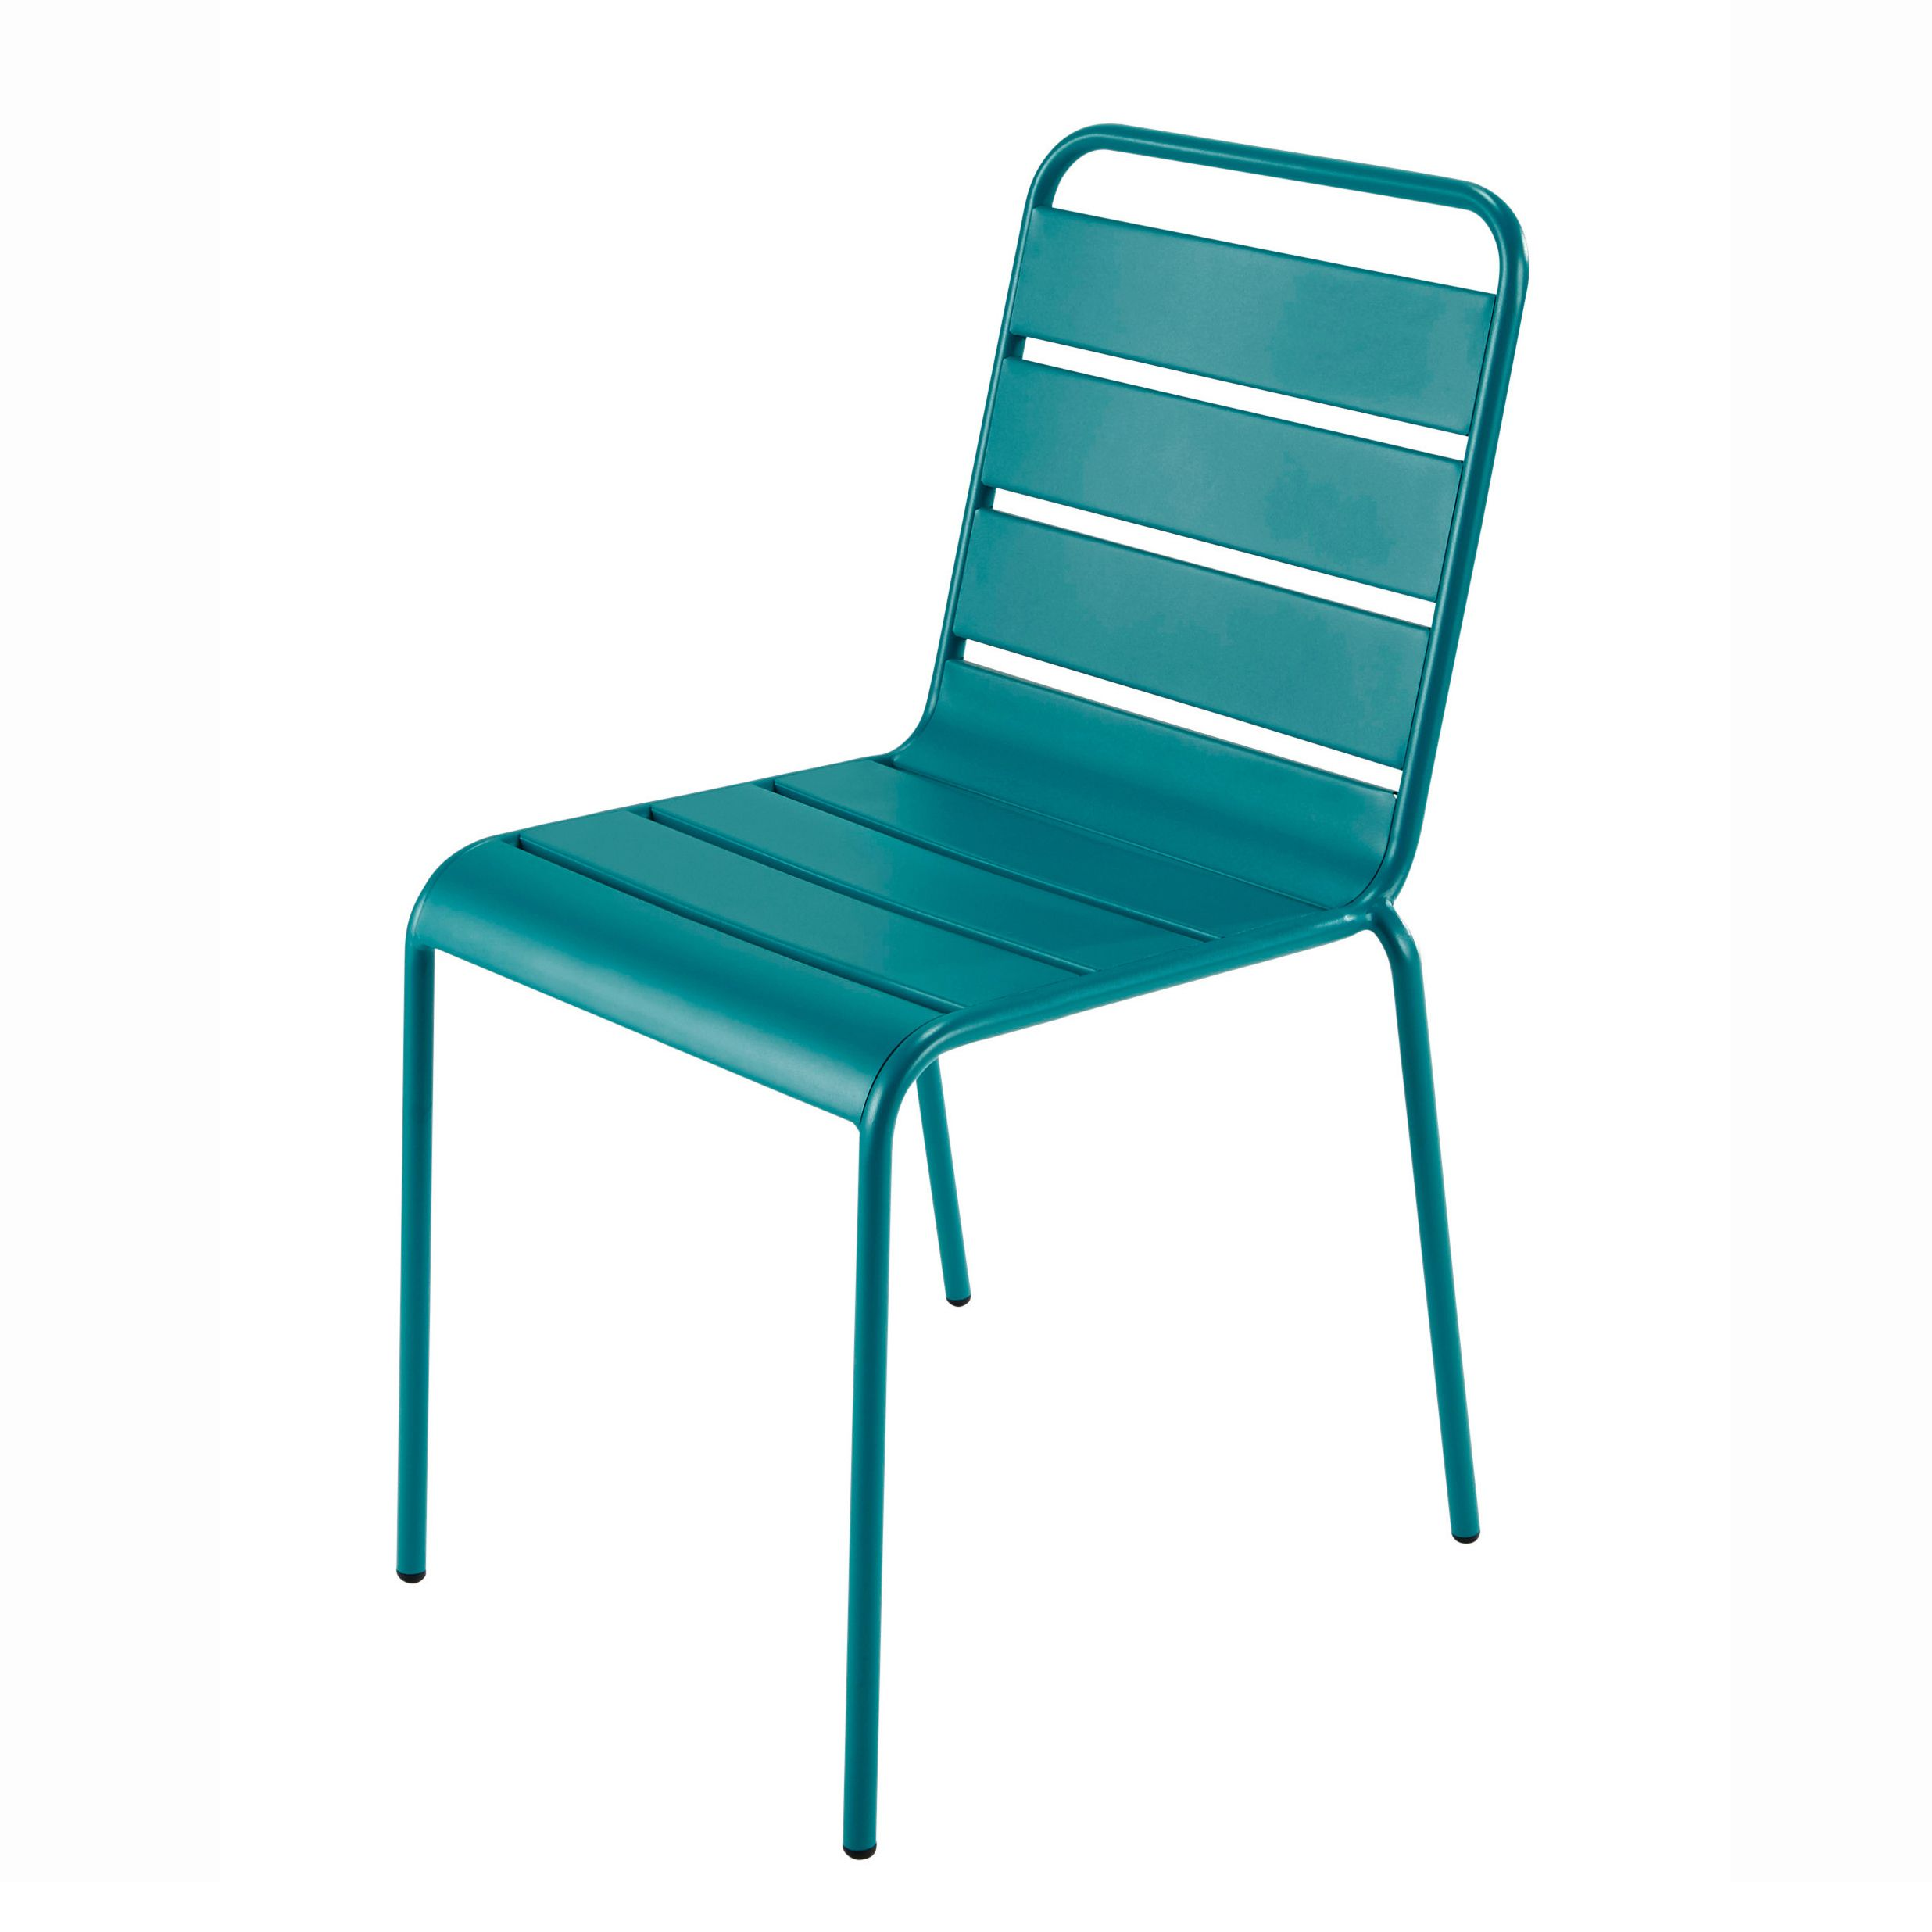 Chaise de jardin en métal bleu canard | Balcon | Garden chairs ...